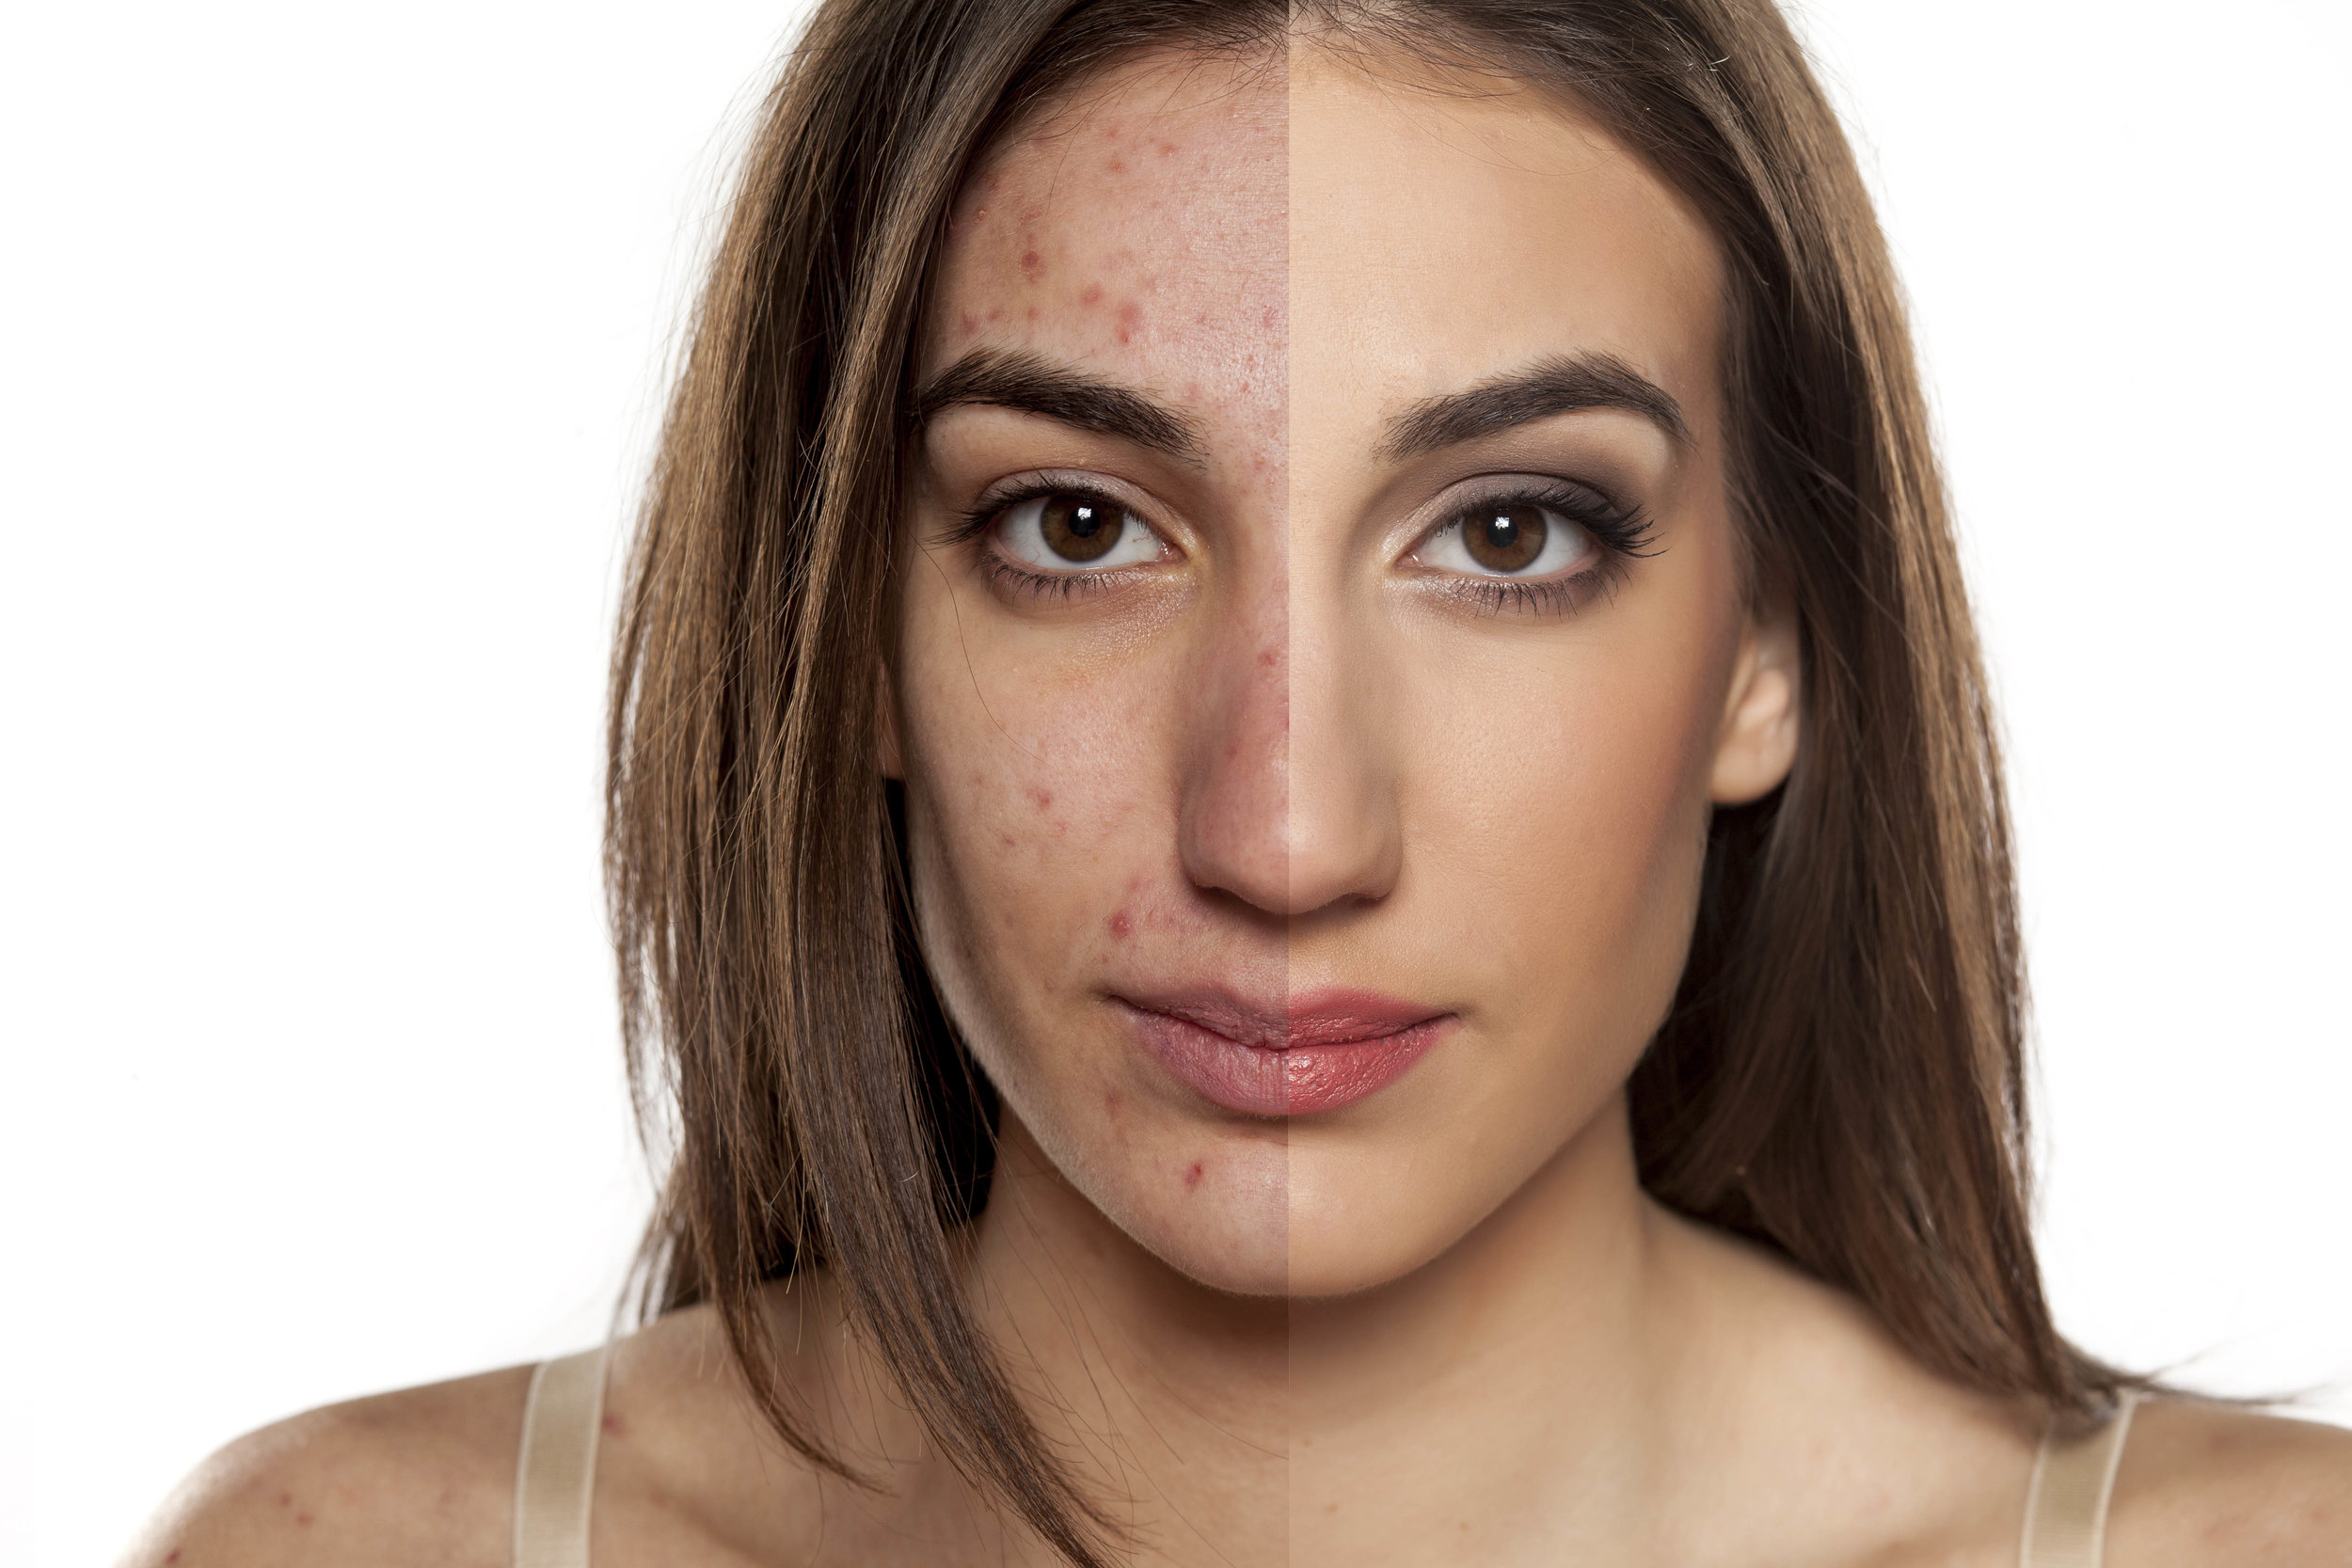 Skin repair, skin tags, red veins, milia, rosacea,pigmentation, problem skin, IMAGE skinpeels, dermalogica facials, microdermabrasion, mesotheraphy, meso vytal, skin peels, skin left, exporex,